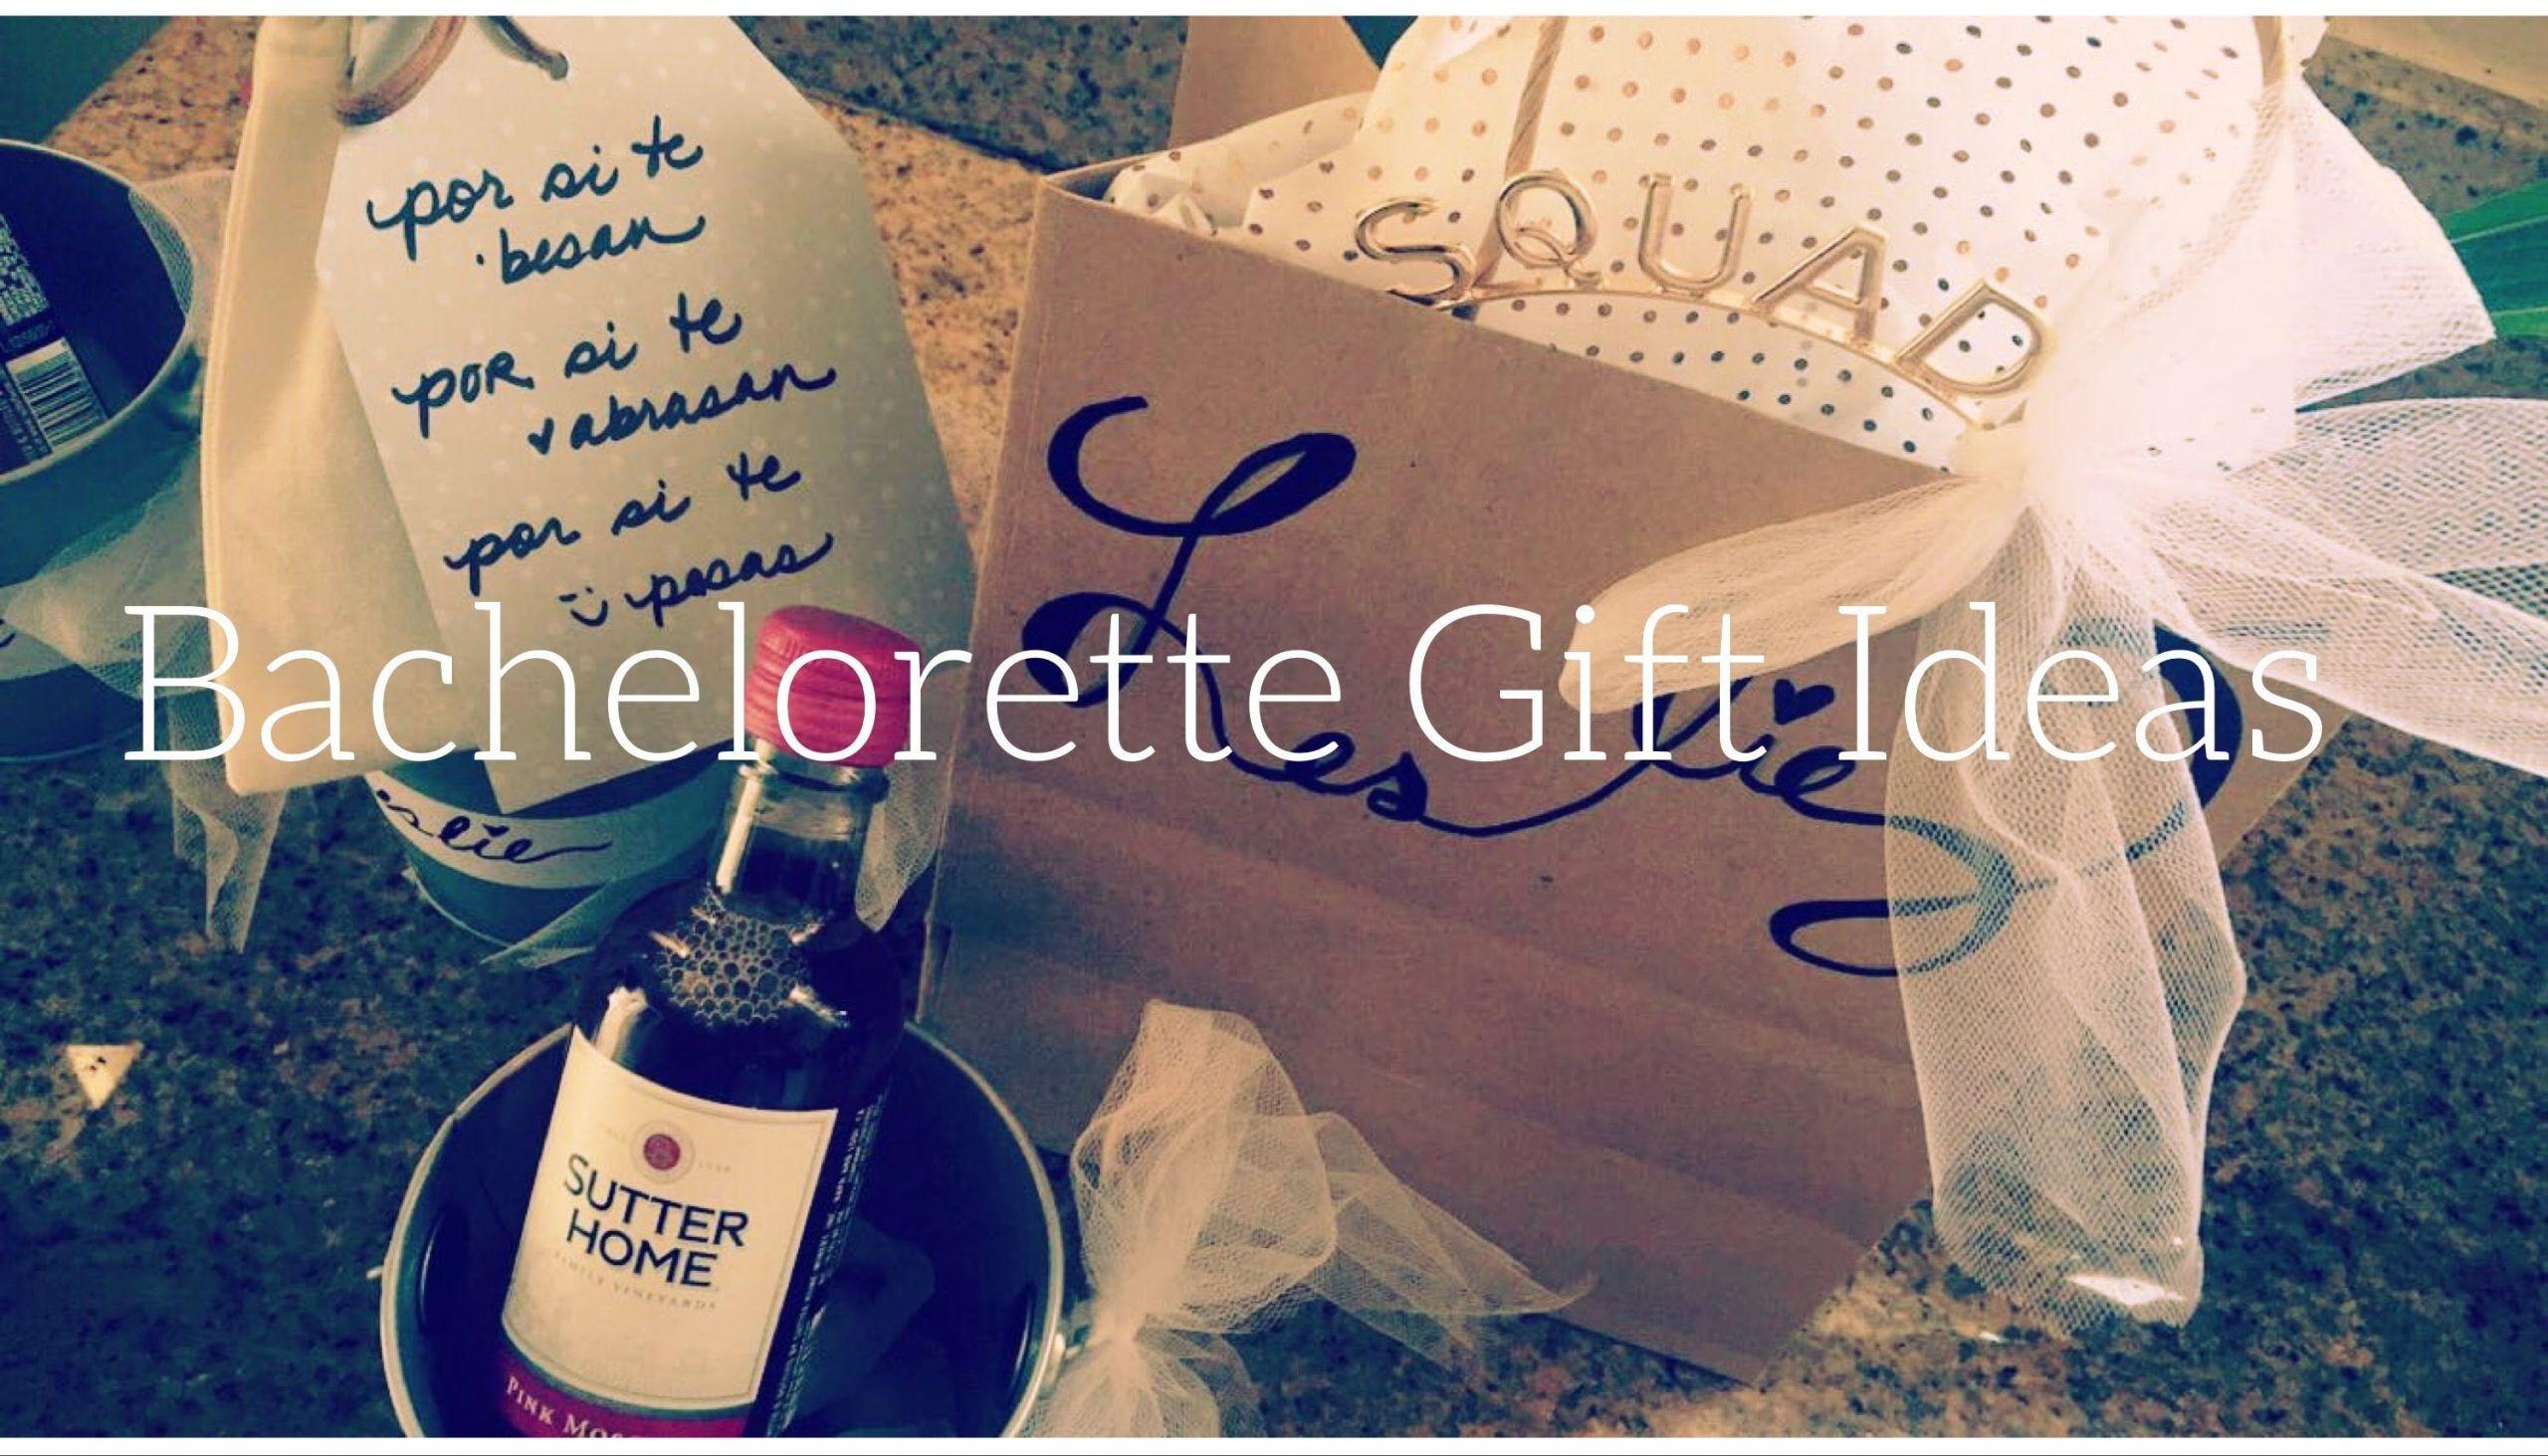 DIY Bachelorette Gift For Bride  DIY Bachelorette Gift Ideas